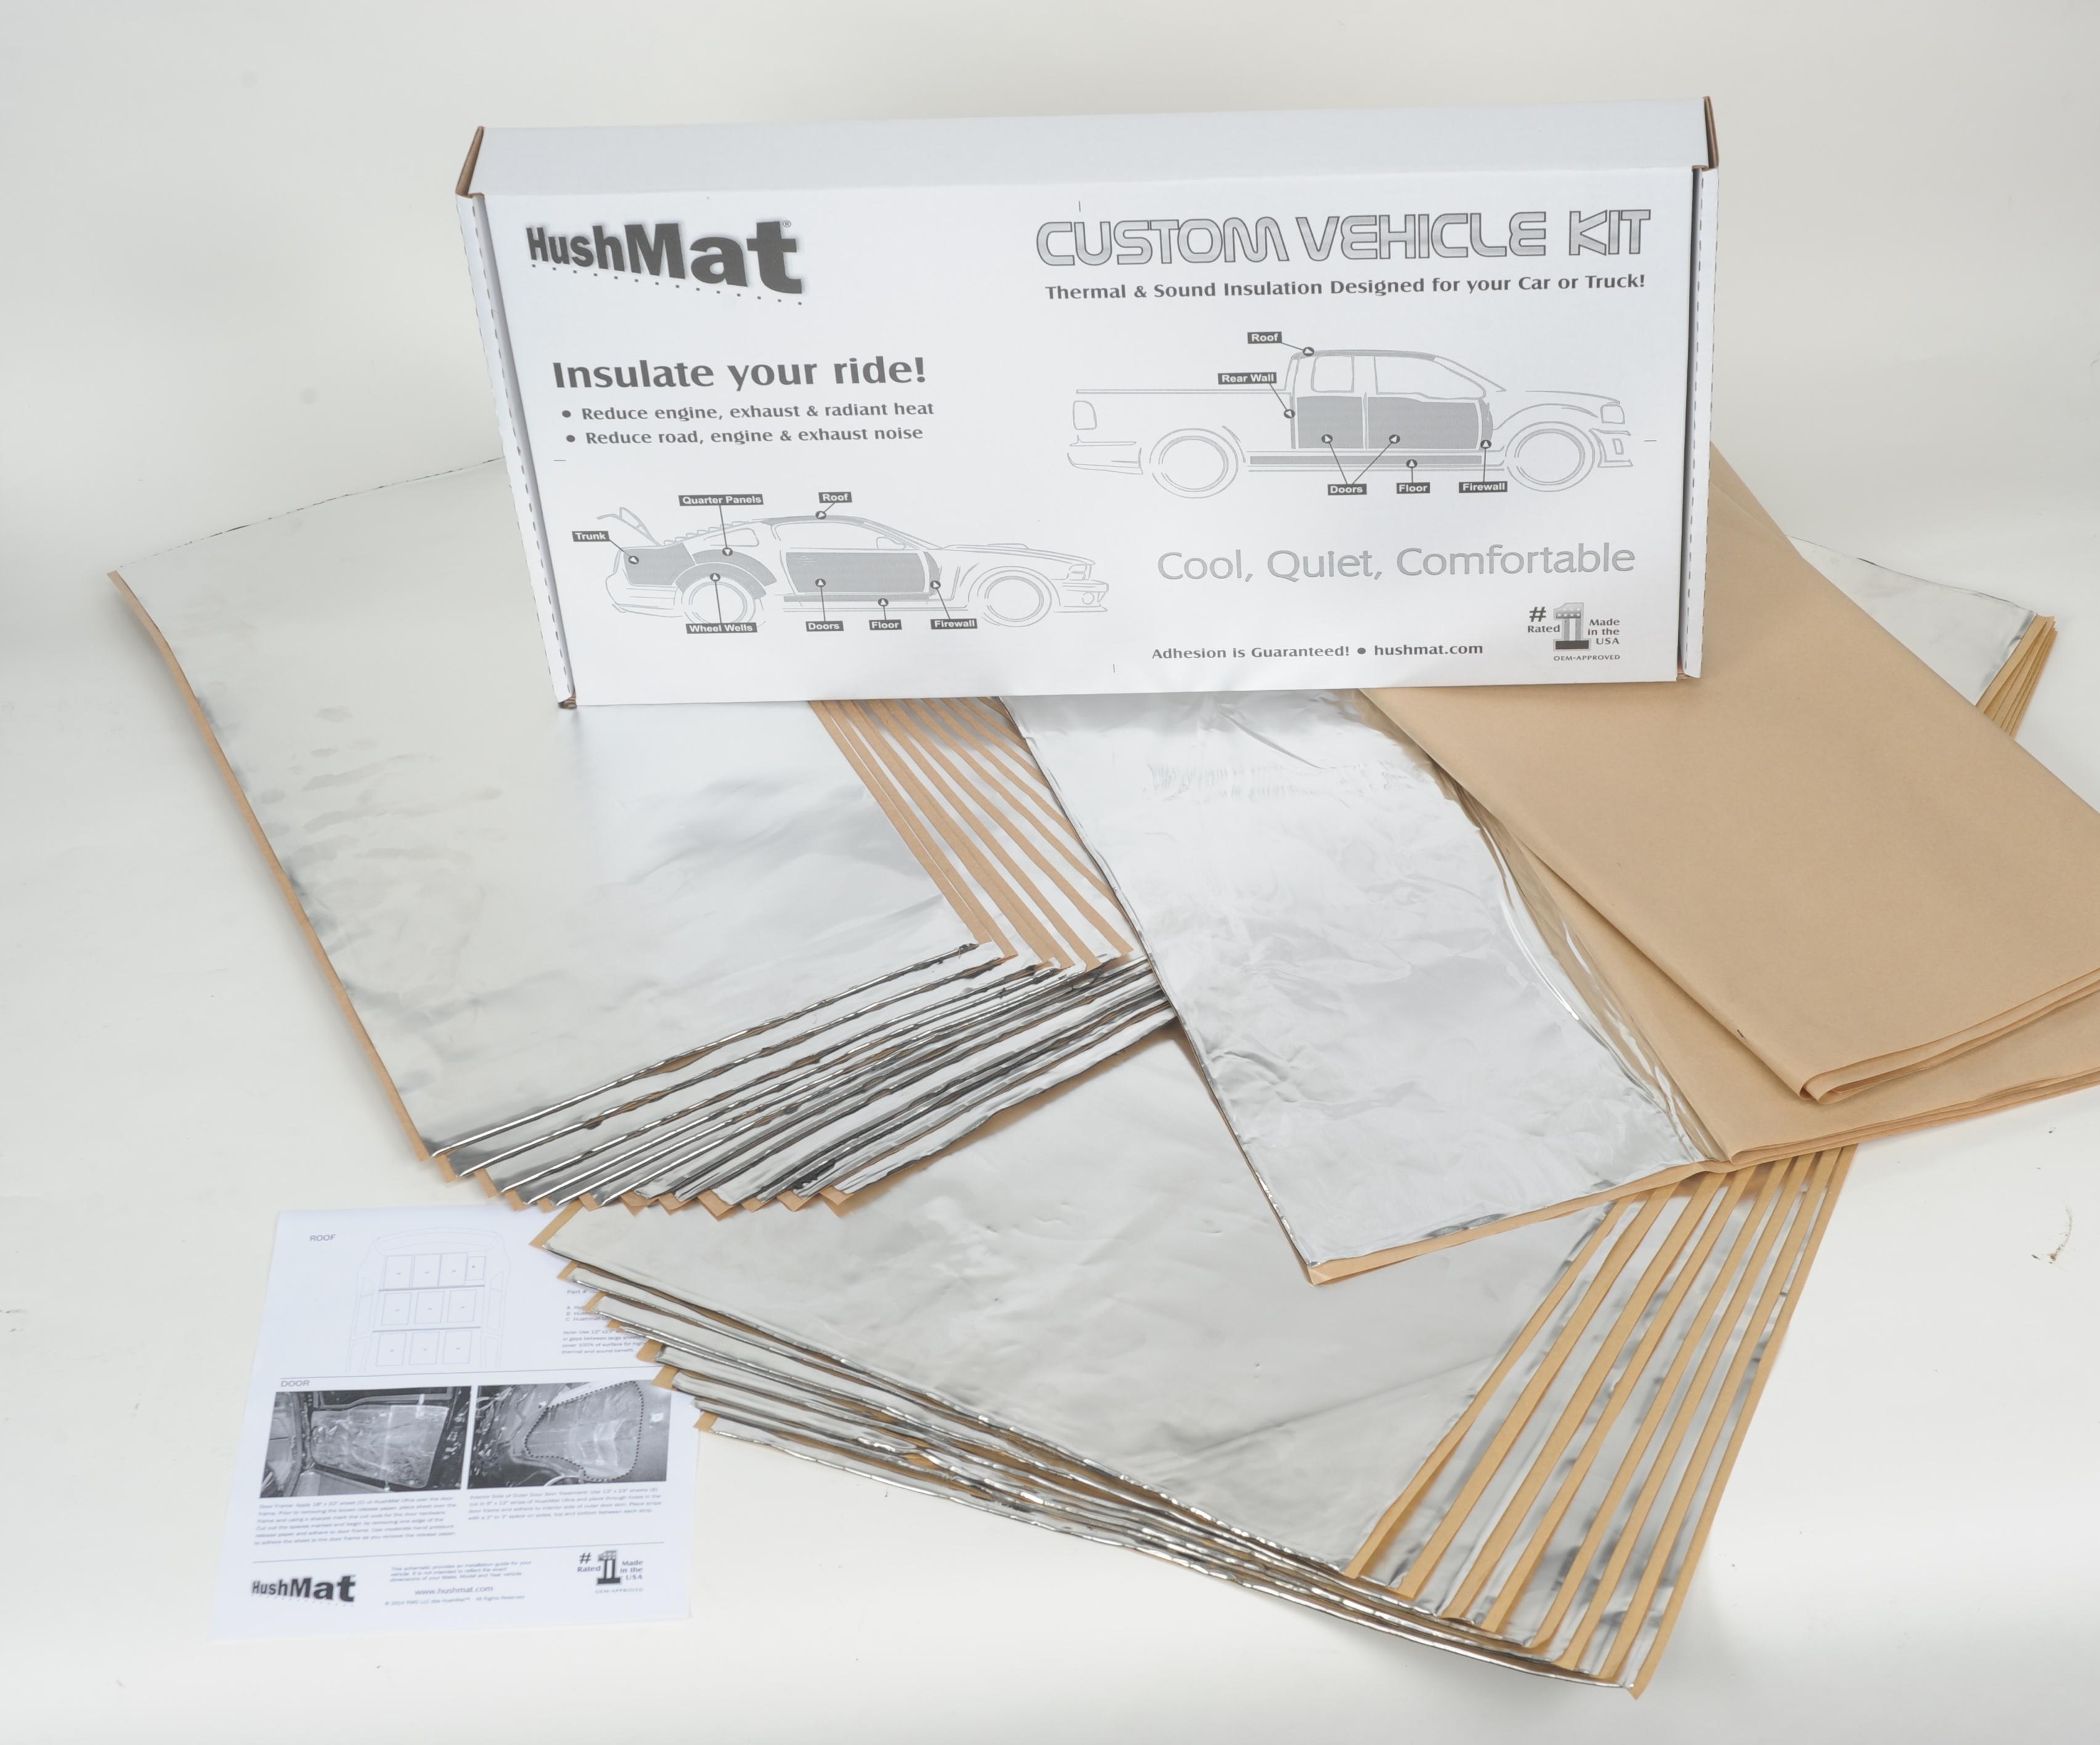 Hushmat 58050 Complete Vehicle Custom Insulation Kit